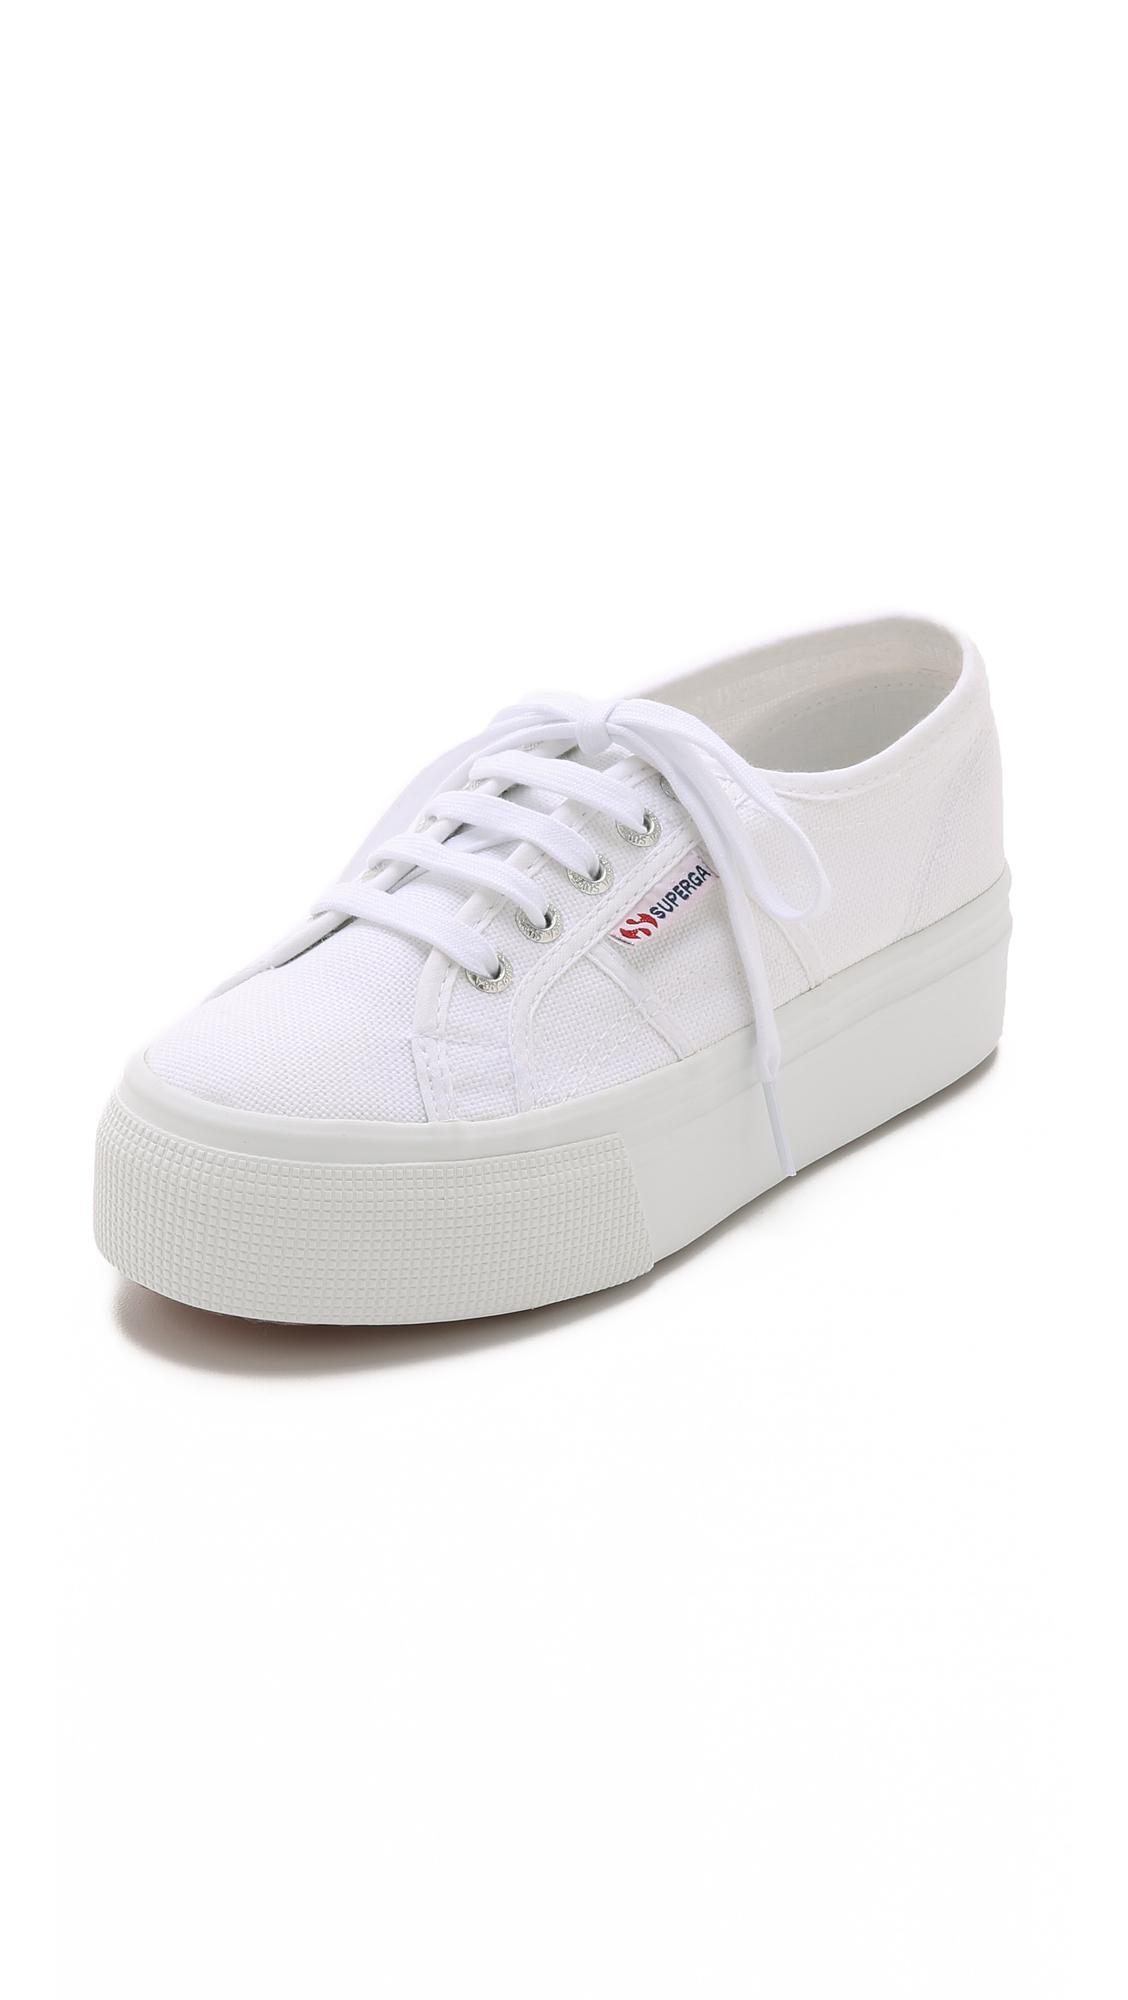 Superga: Superga Platform Sneakers In White